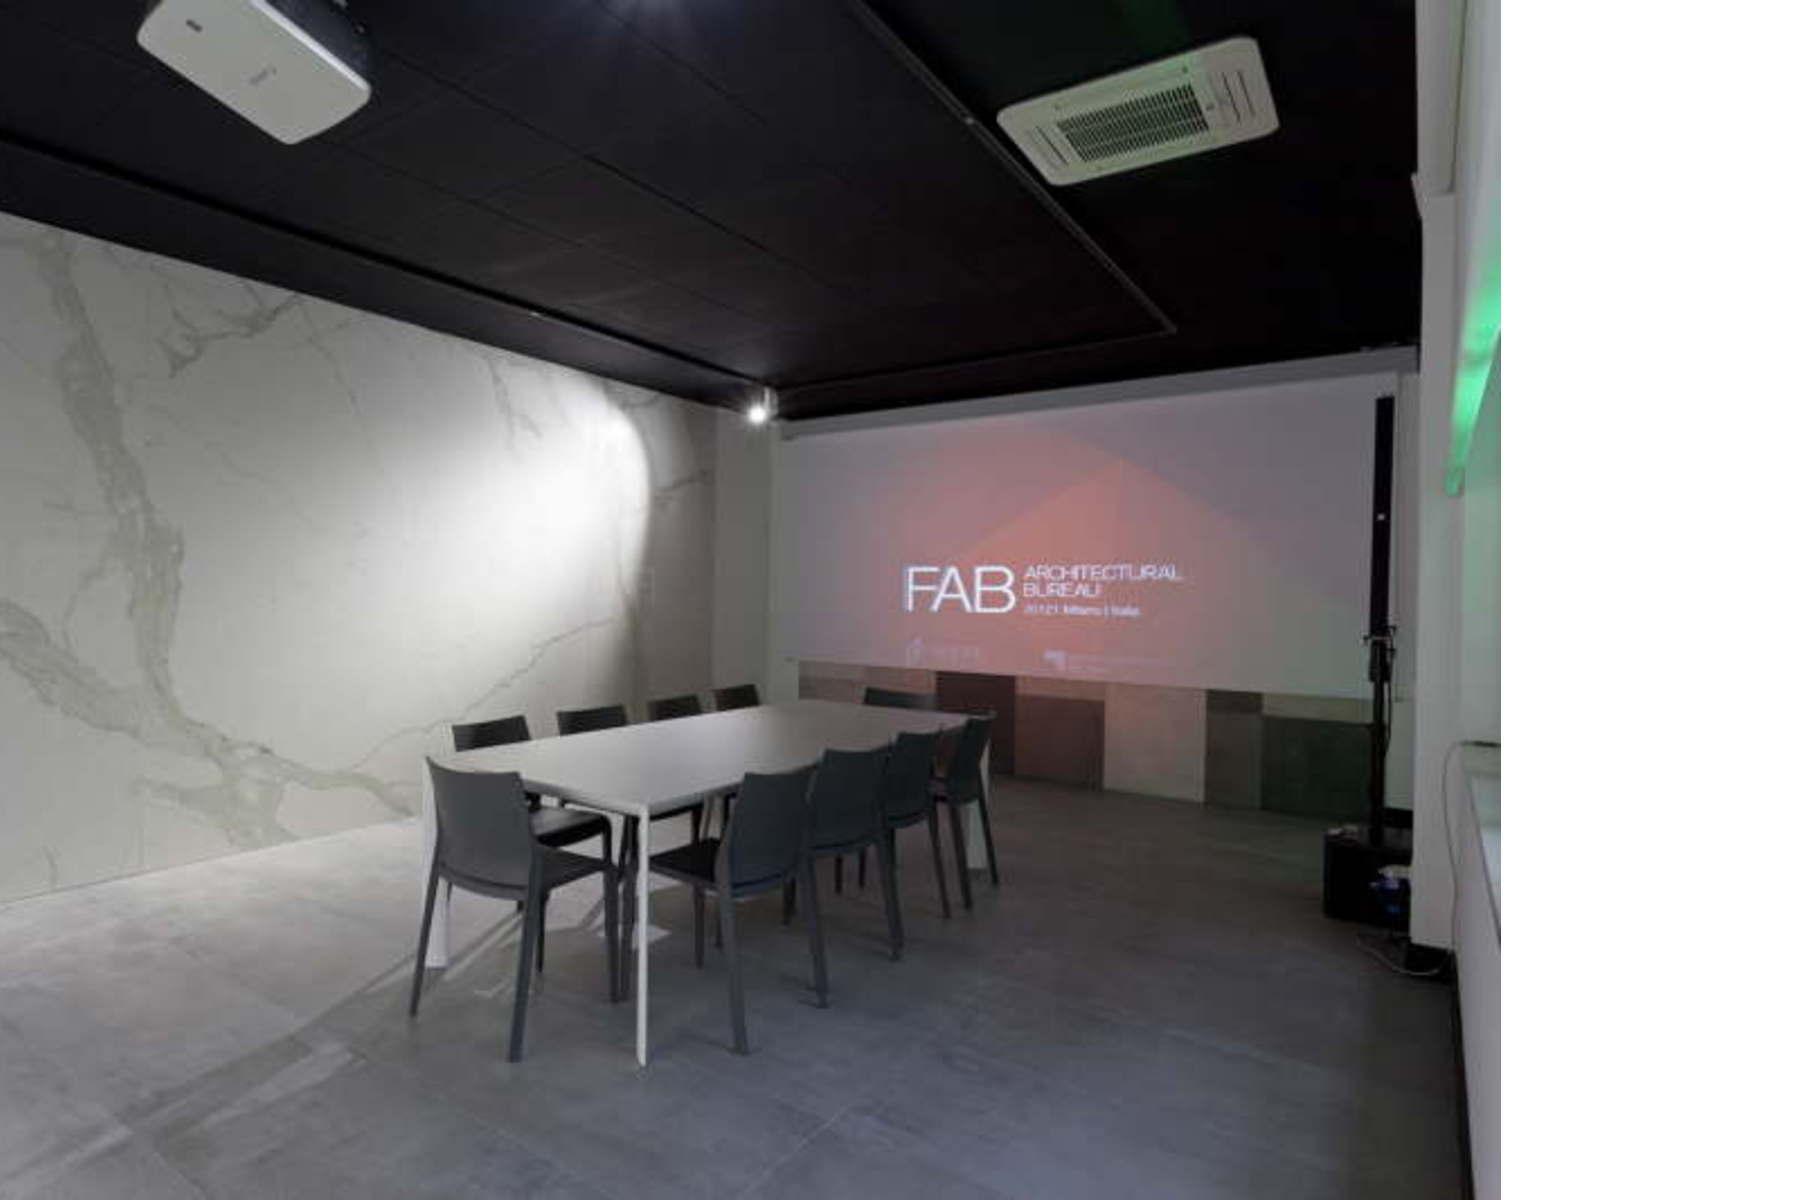 Fab architectural bureau milan new fiandre group creative space